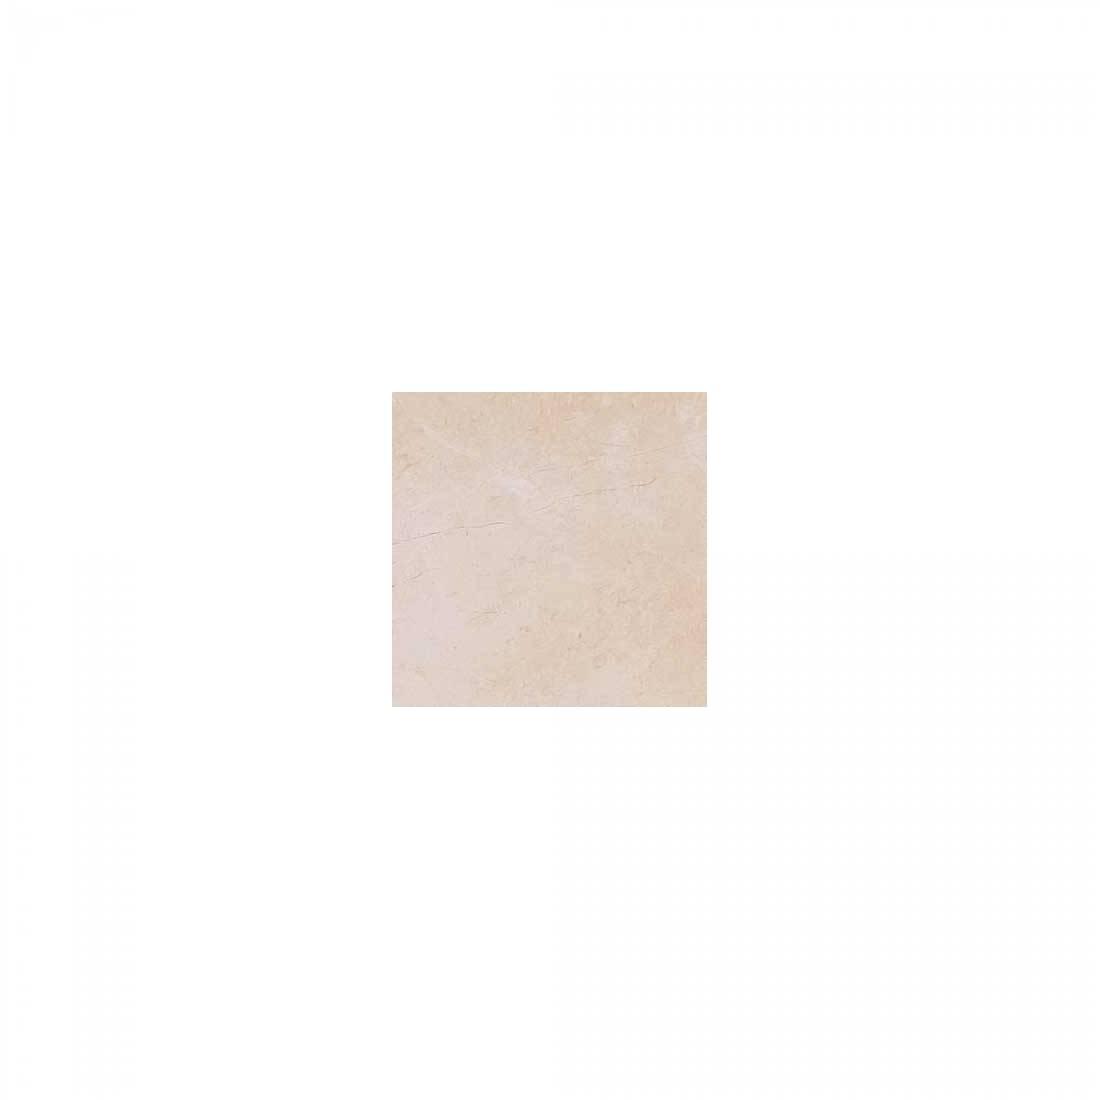 Caliza 30x30 Sand Gloss 1